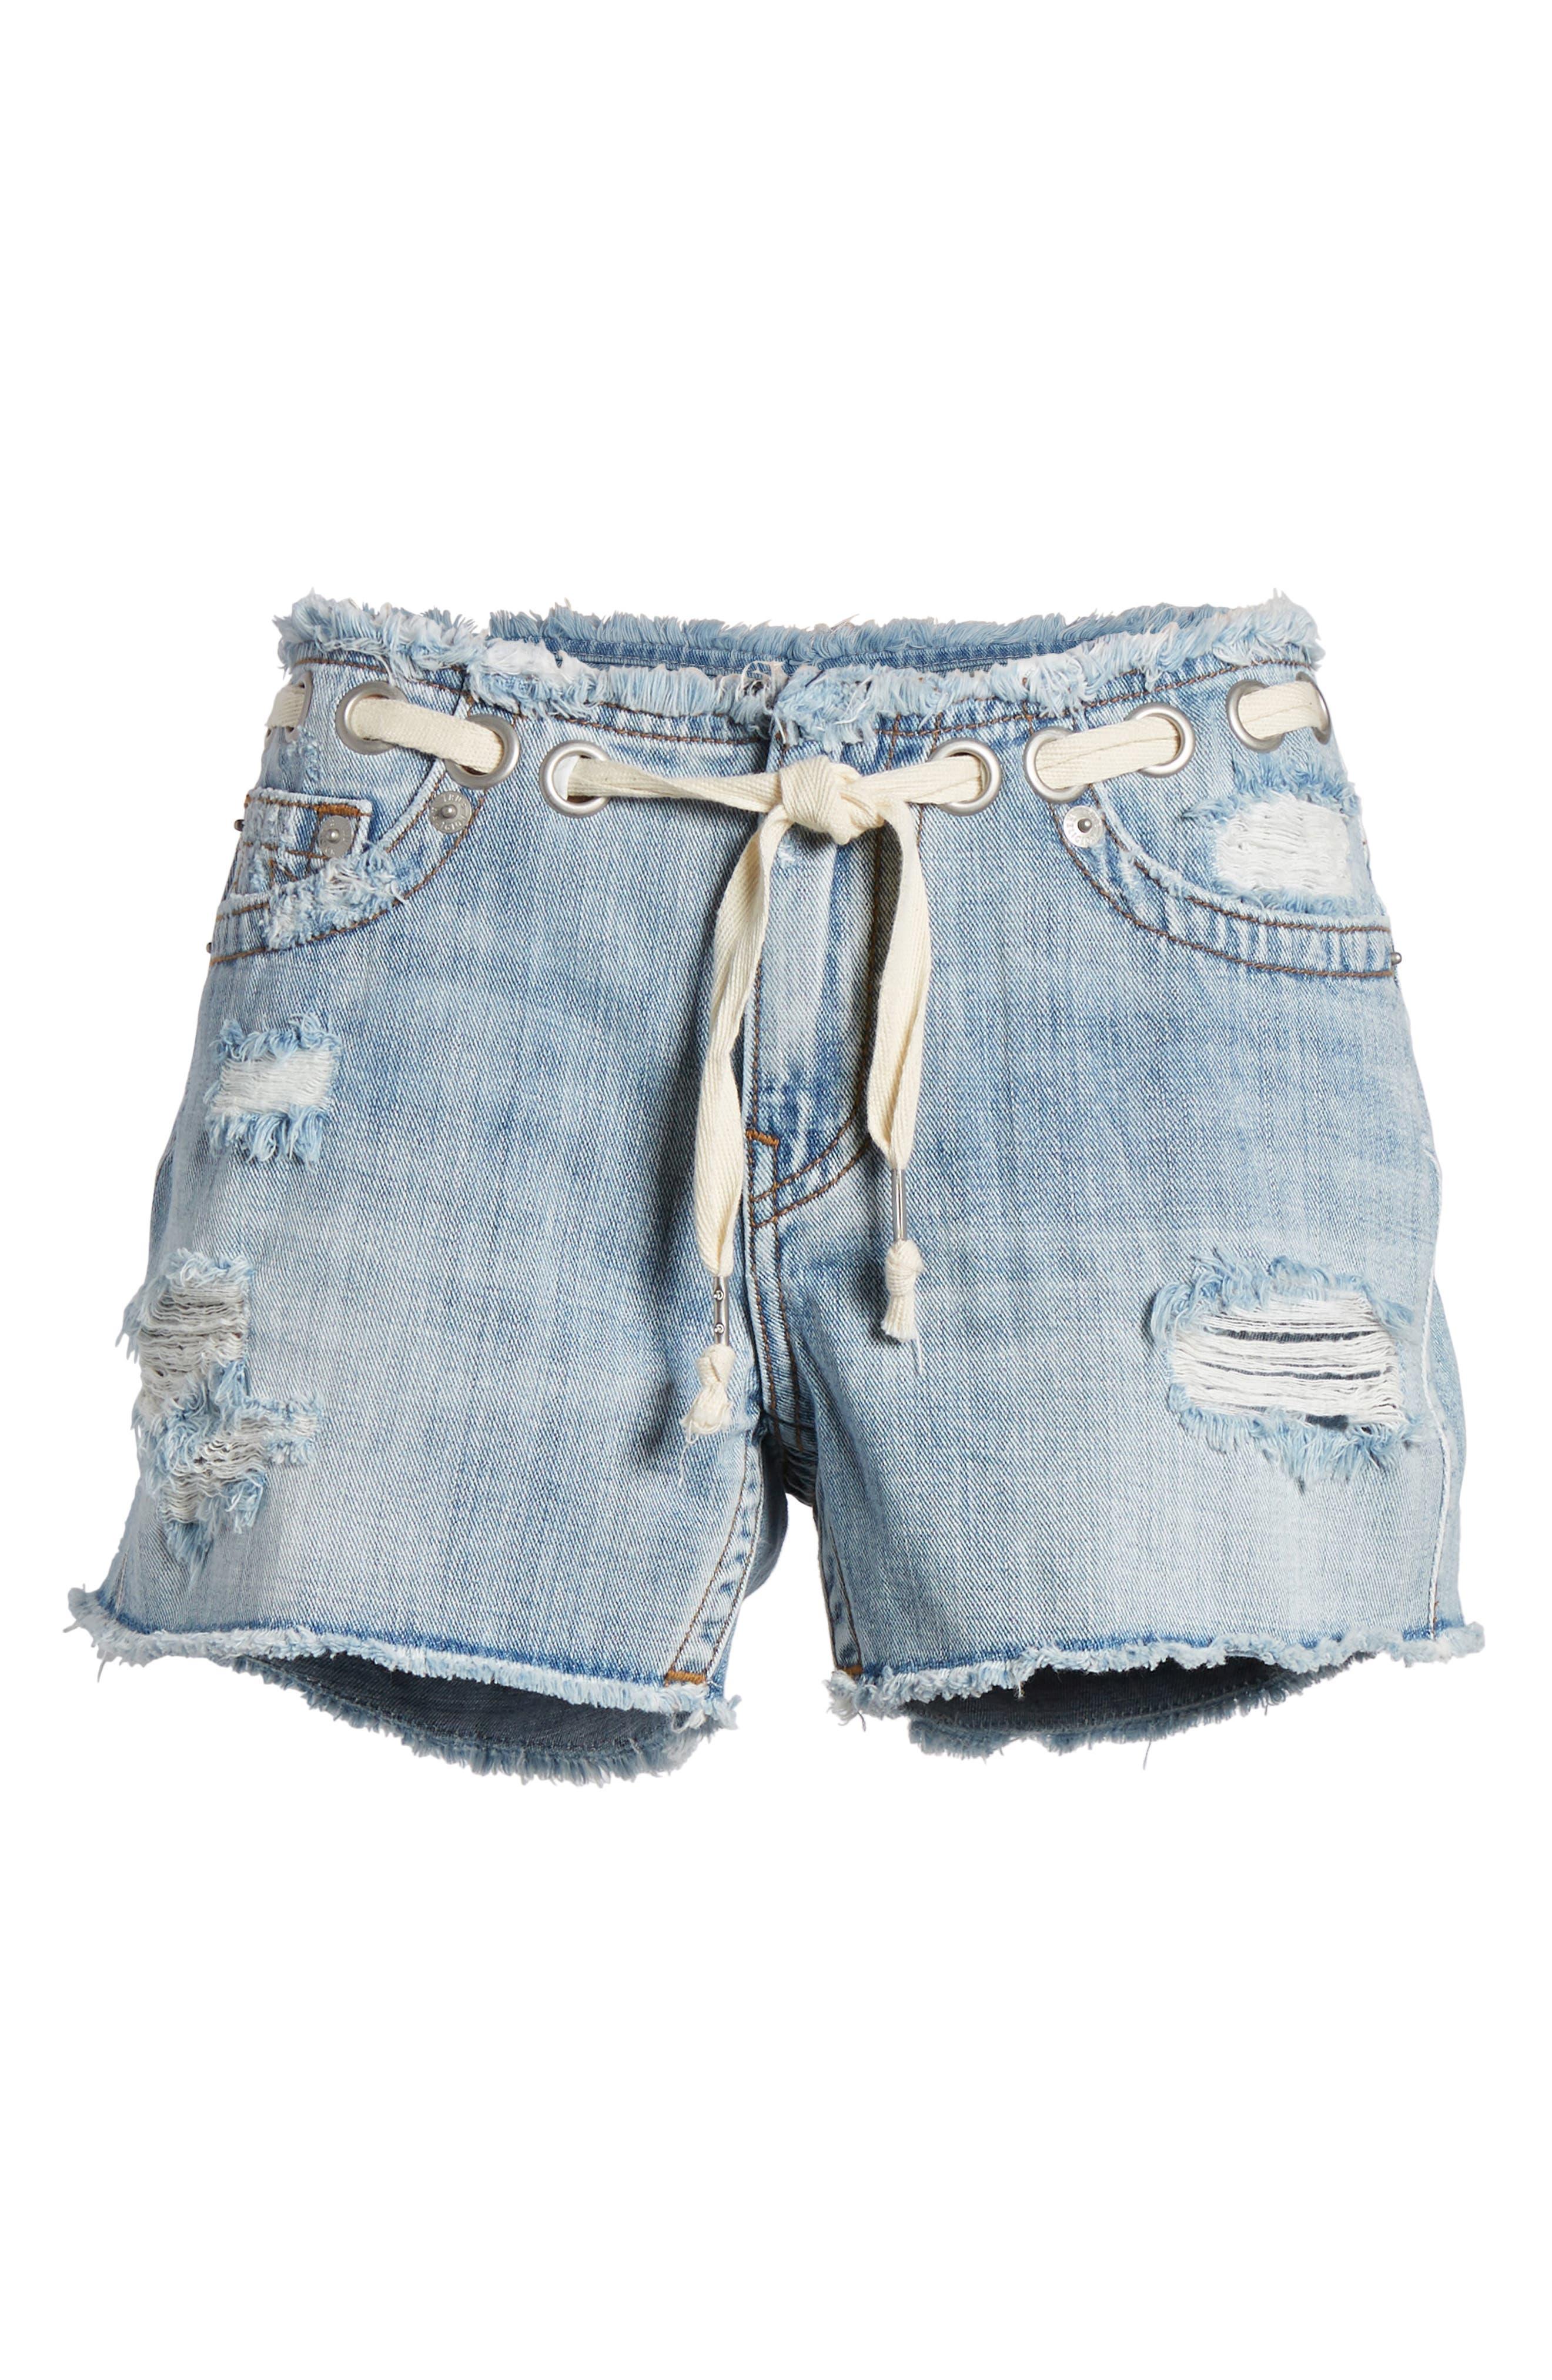 Fashion Distressed Denim Shorts,                             Alternate thumbnail 7, color,                             401